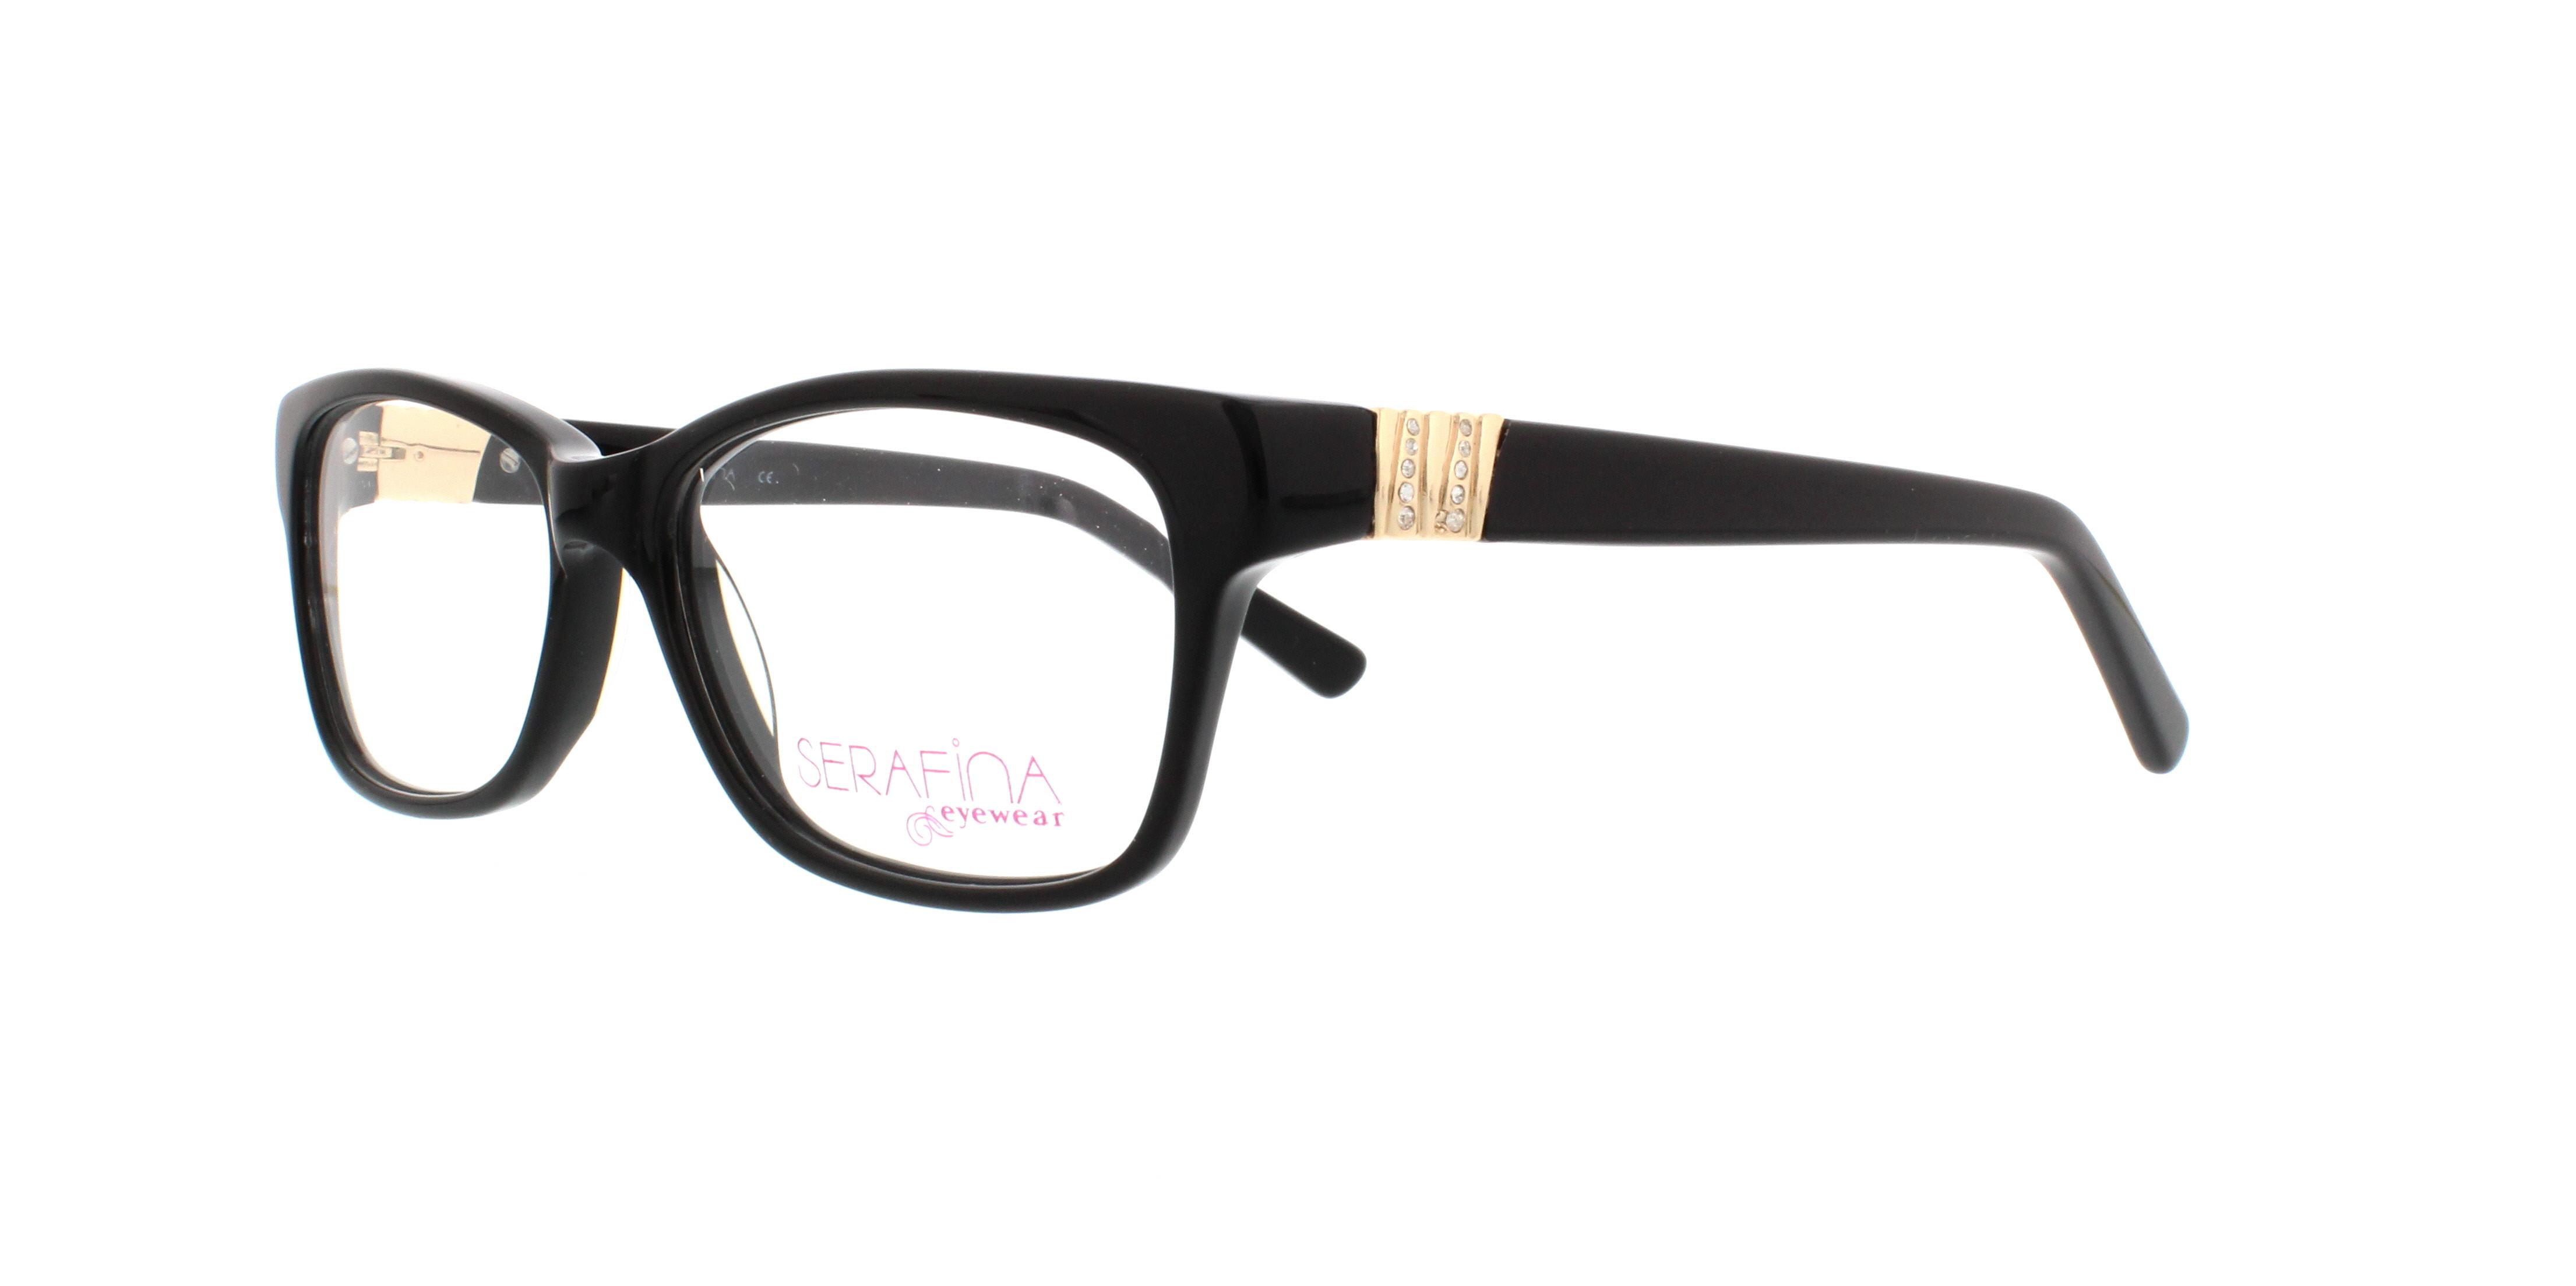 serafina single women Shop serafina joanie women prescription eyeglasses acetate full rims with square lenses, and acetate temples subtle nose grooves available in single vision, bifocal or progressive lenses.